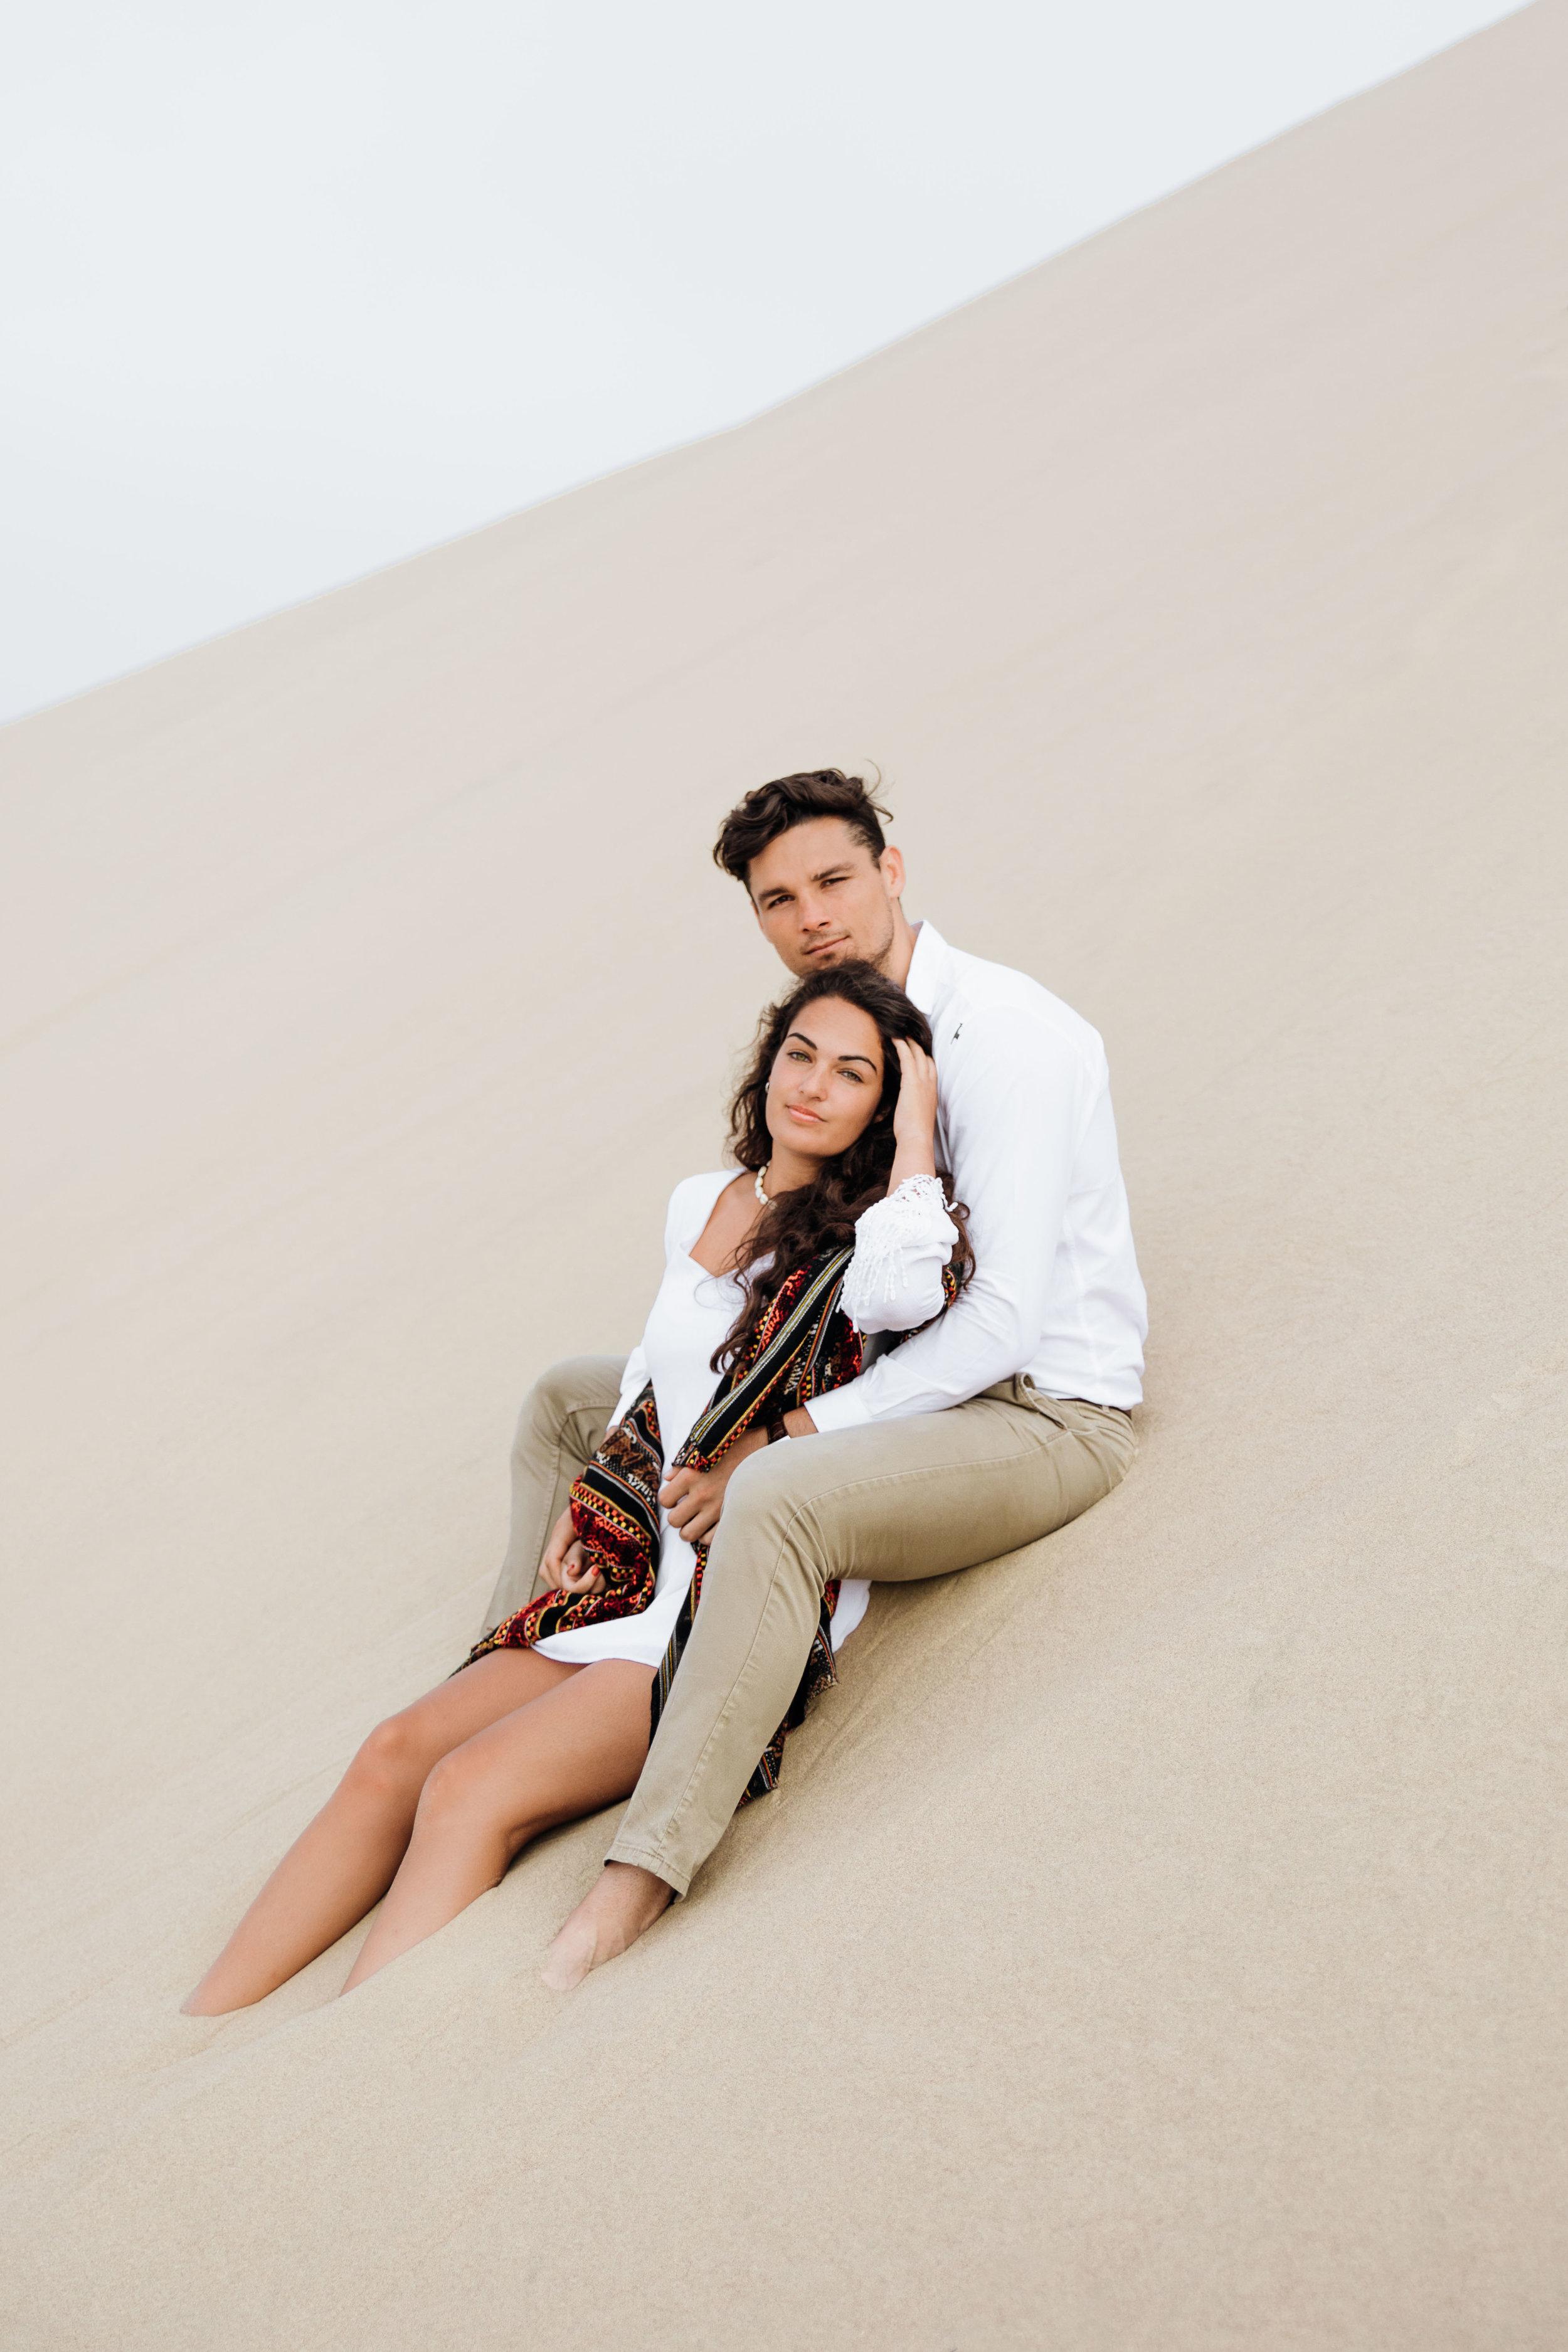 huacachina-peru-honeymoon-elopement-destination-wedding-photography-michael-cozzens-38.jpg